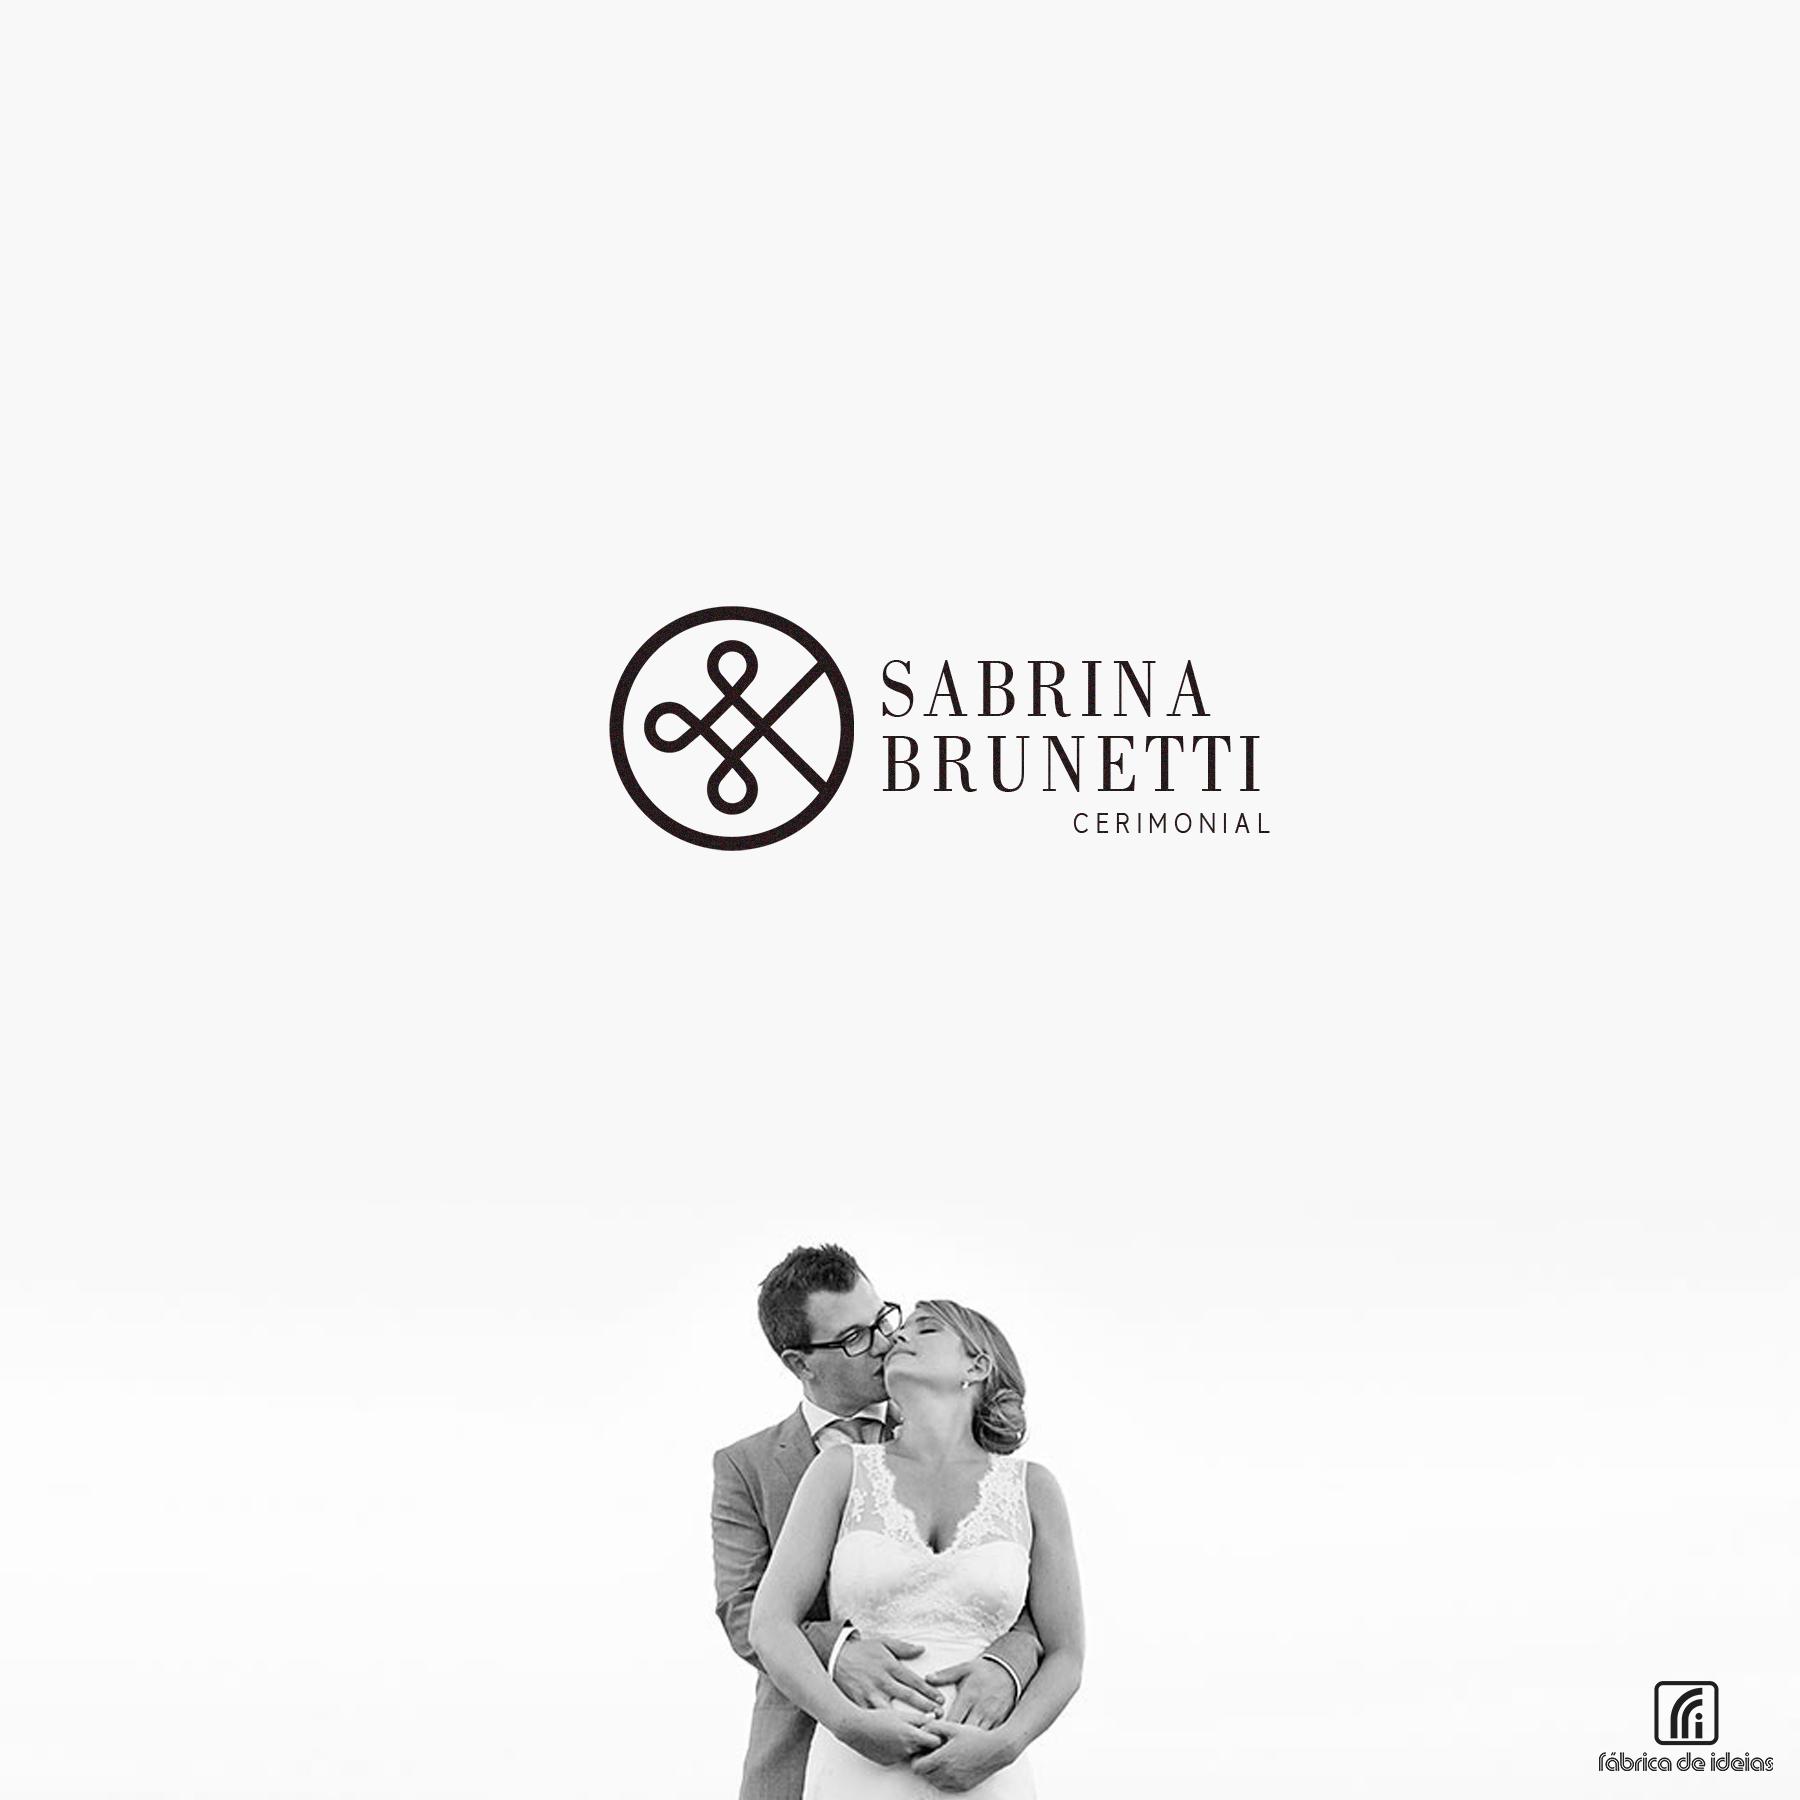 85516f31199469.5645493a880d1 - Sabrina Brunetti